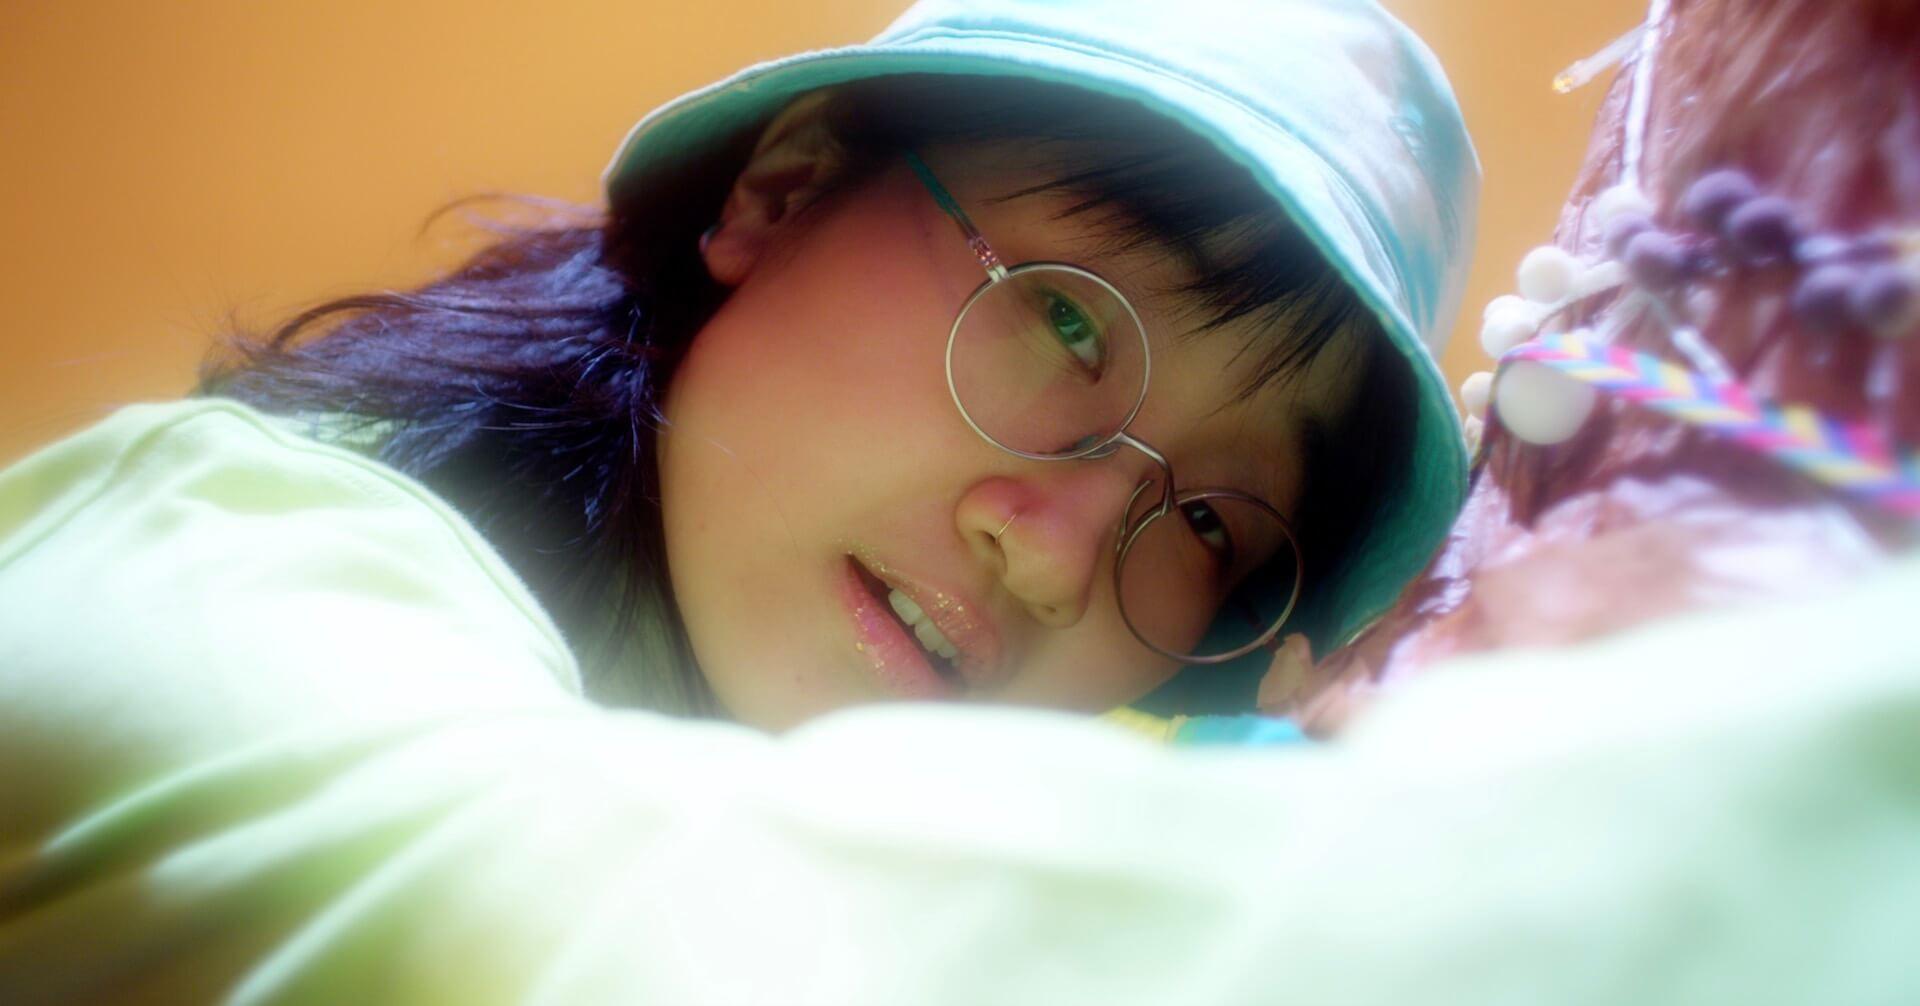 Yaejiが先着1000名限定オンラインパーティーをClub Quarantineにて開催!本人のInstagramにて詳細発表 music200508_yaeji_02